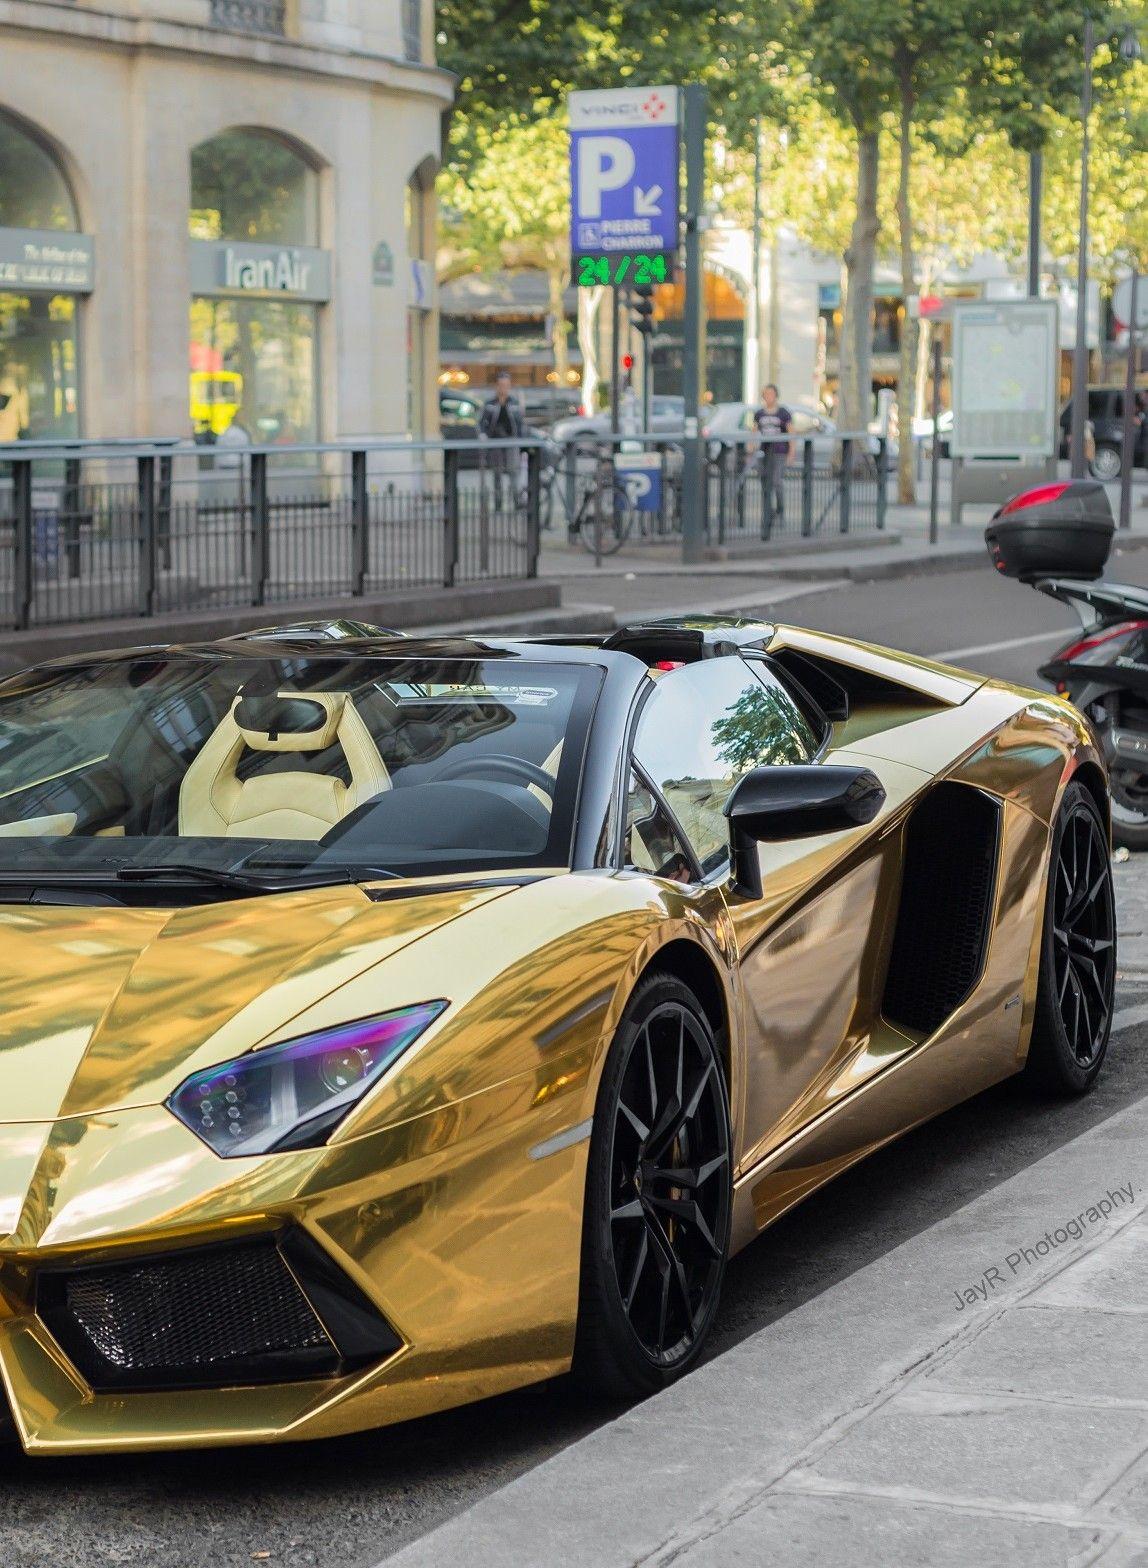 Lamborghini Aventador Gold Lucky Auto Body In Beaverton Or Is